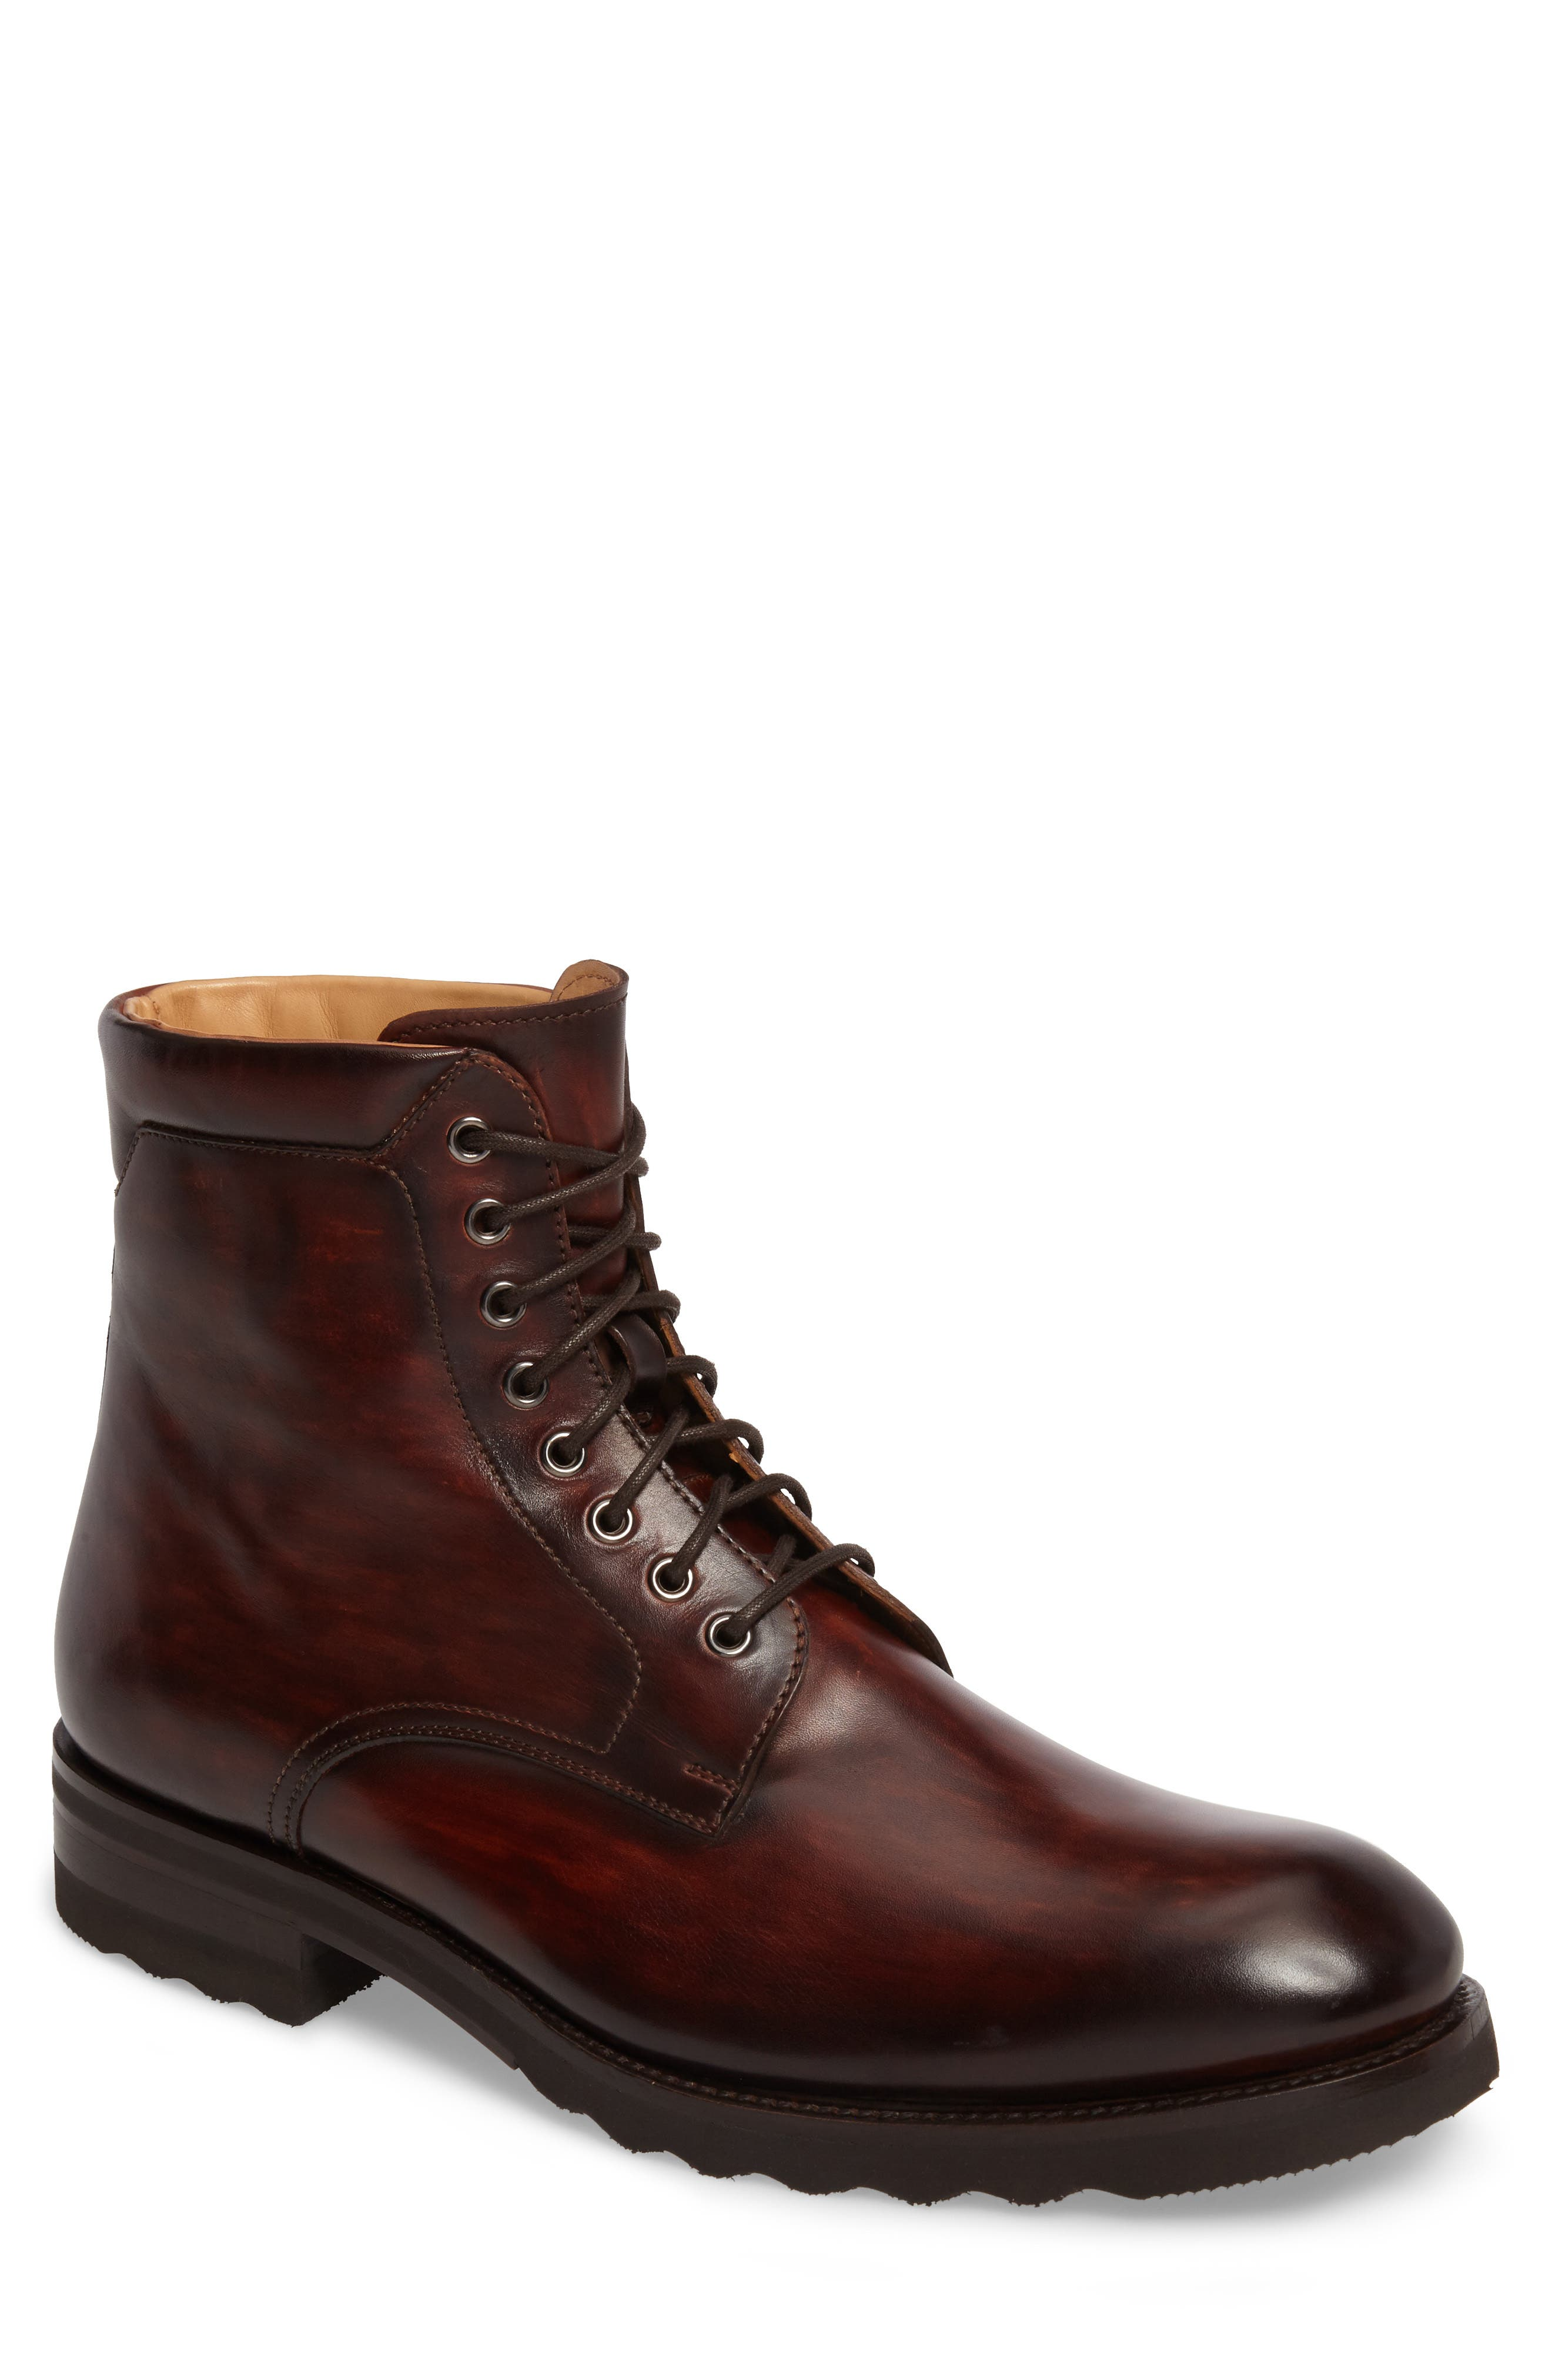 Saxon Plain Toe Boot,                         Main,                         color, 210